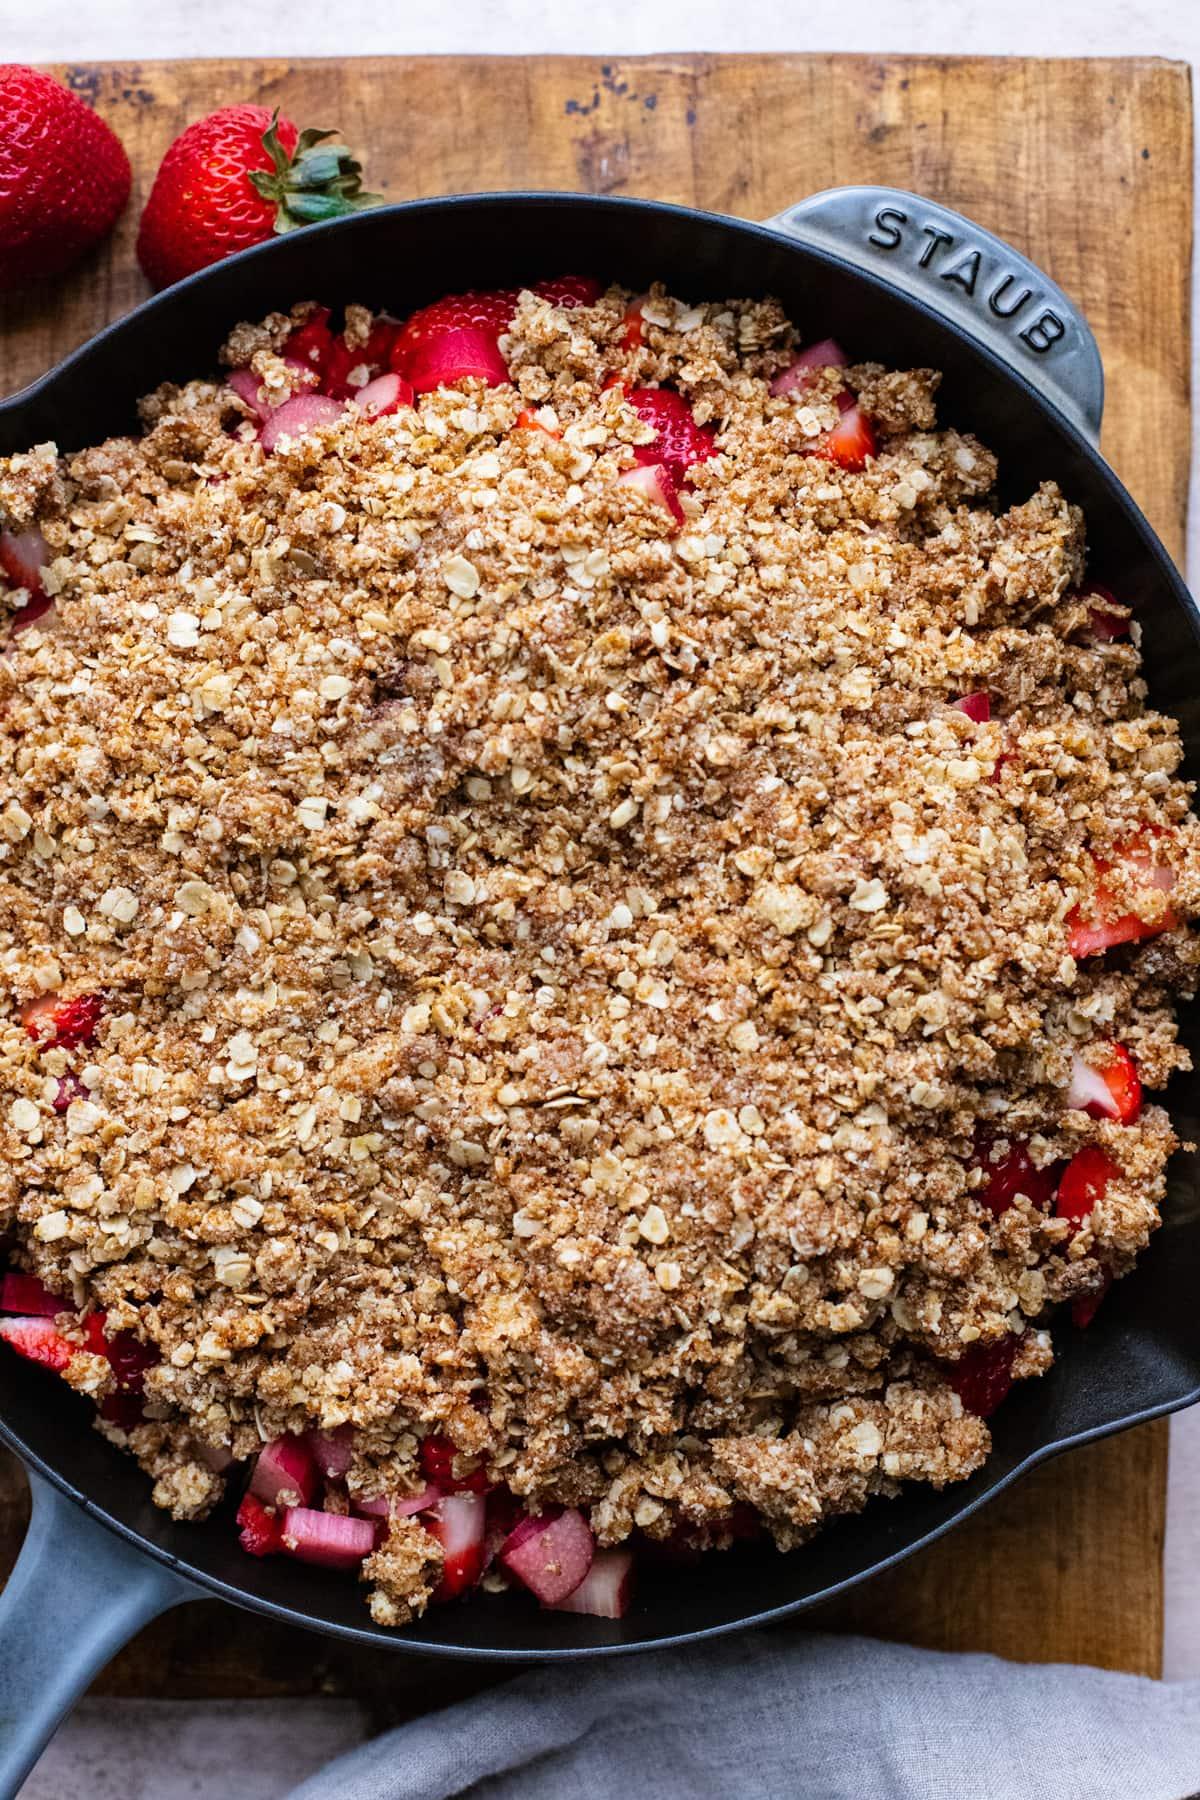 skillet pan with gluten free strawberry rhubarb crisp in it.